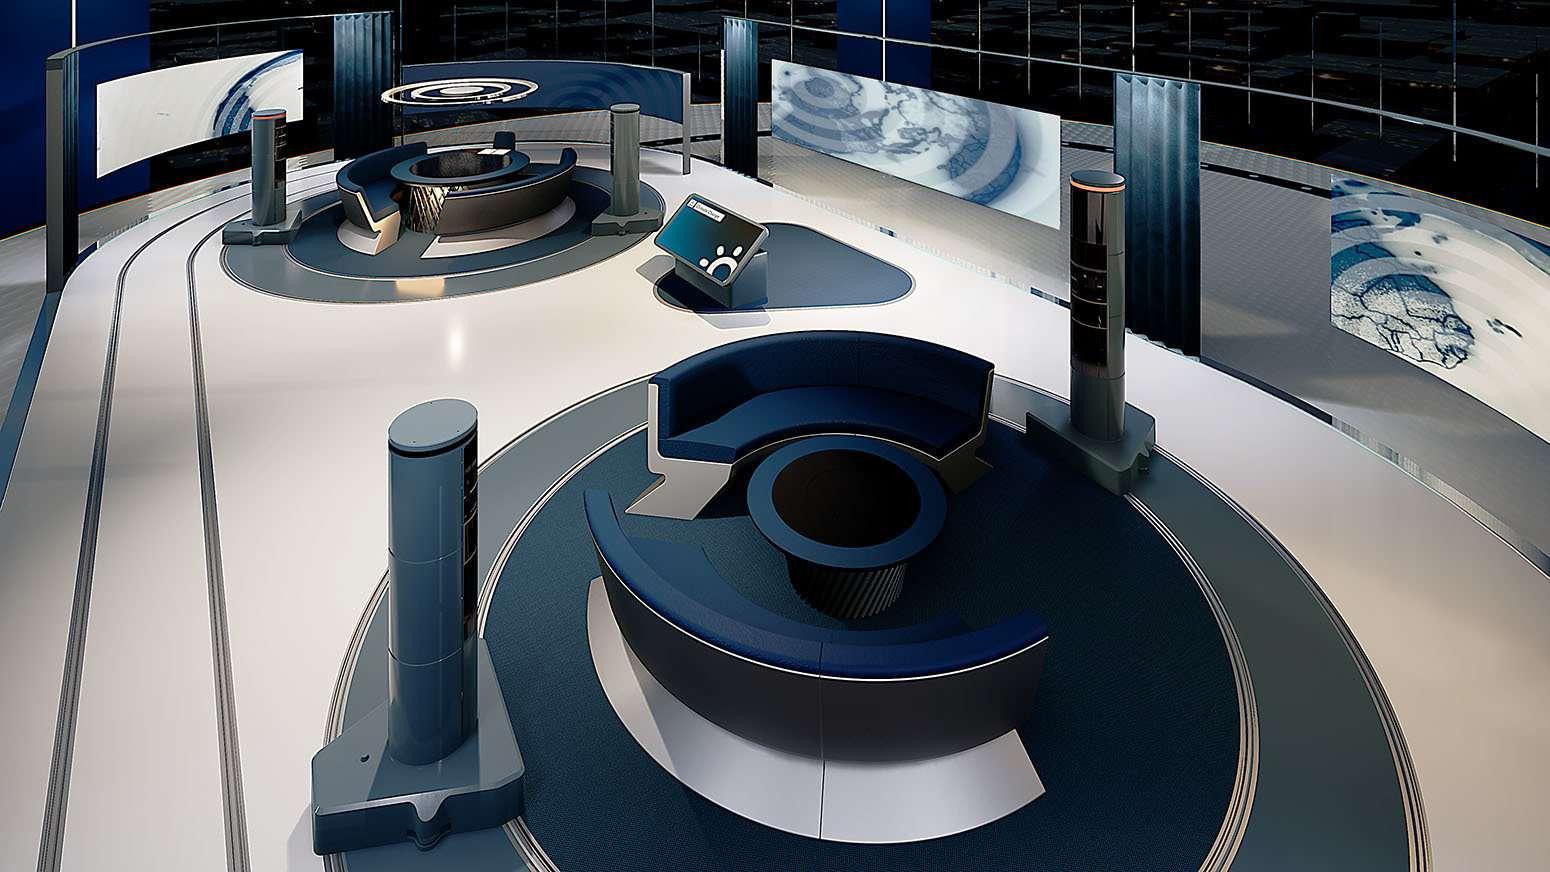 Concept image for The News Pavilion.